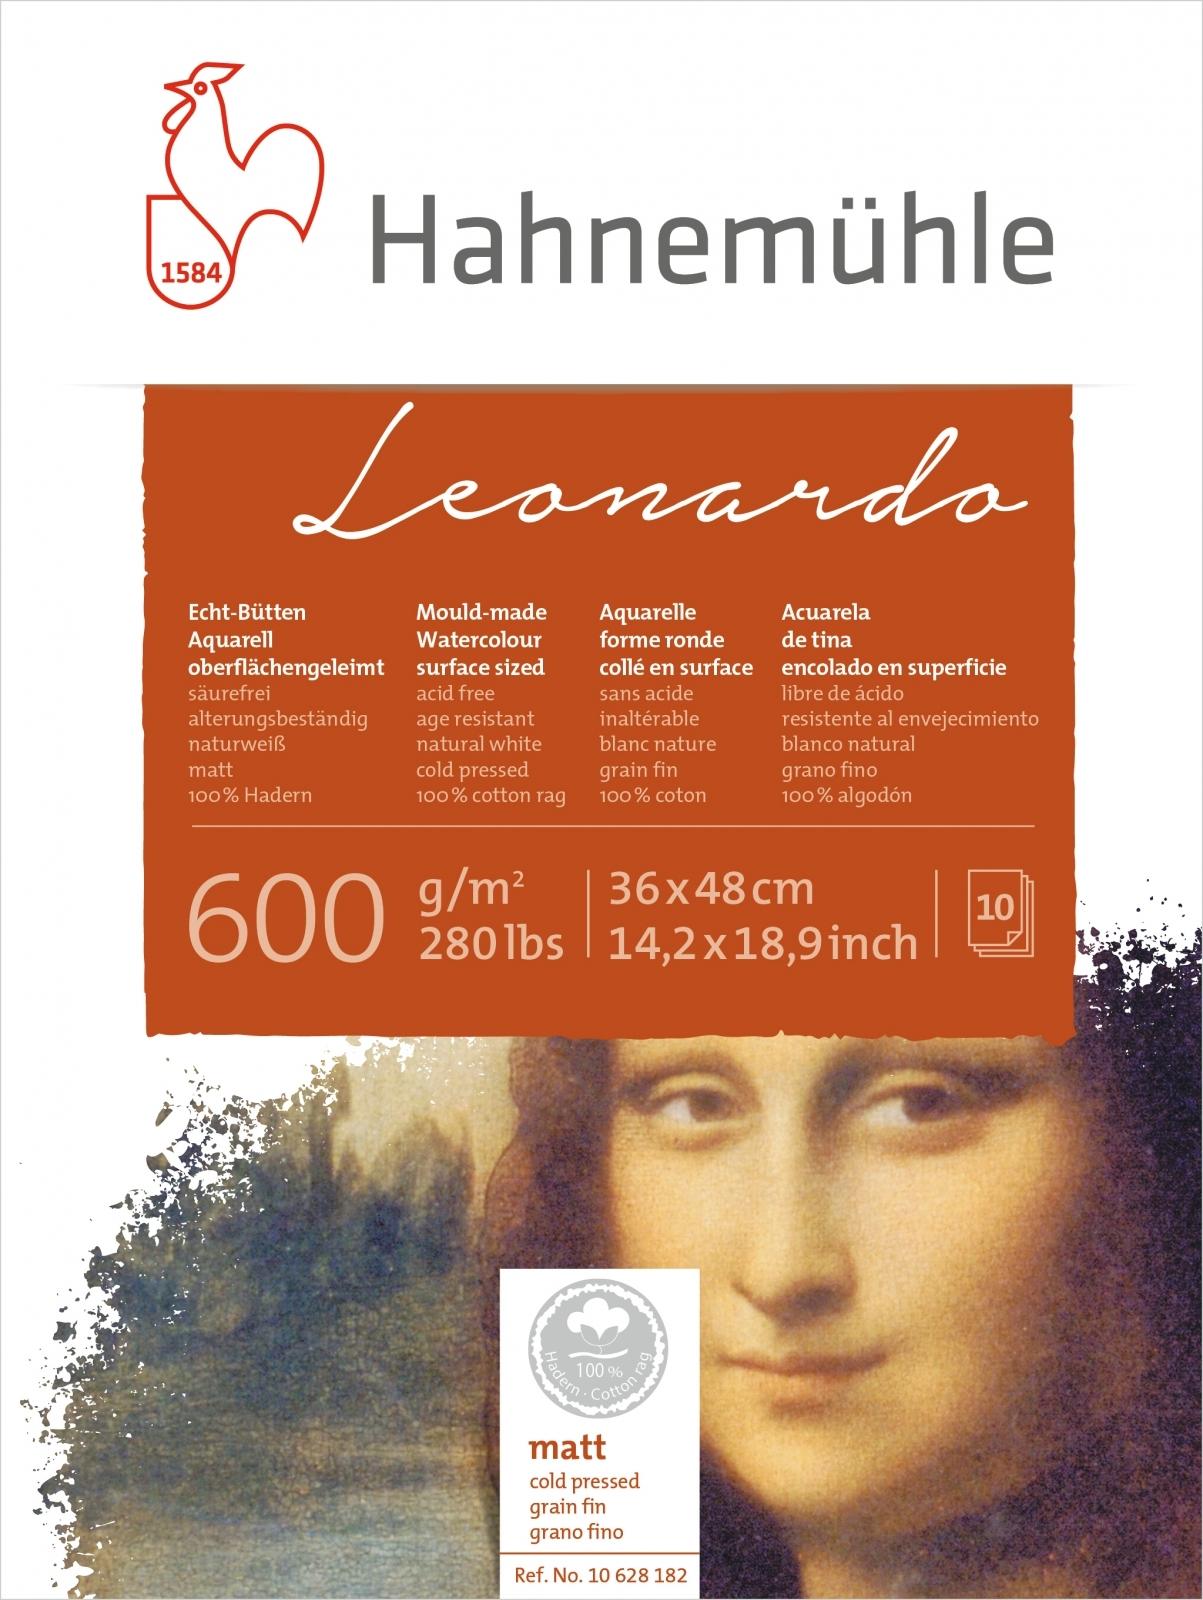 Papel Hahnemuhle Leonardo Textura Fina 600g/m2 36x48 10fls 1 - Papelaria Botafogo